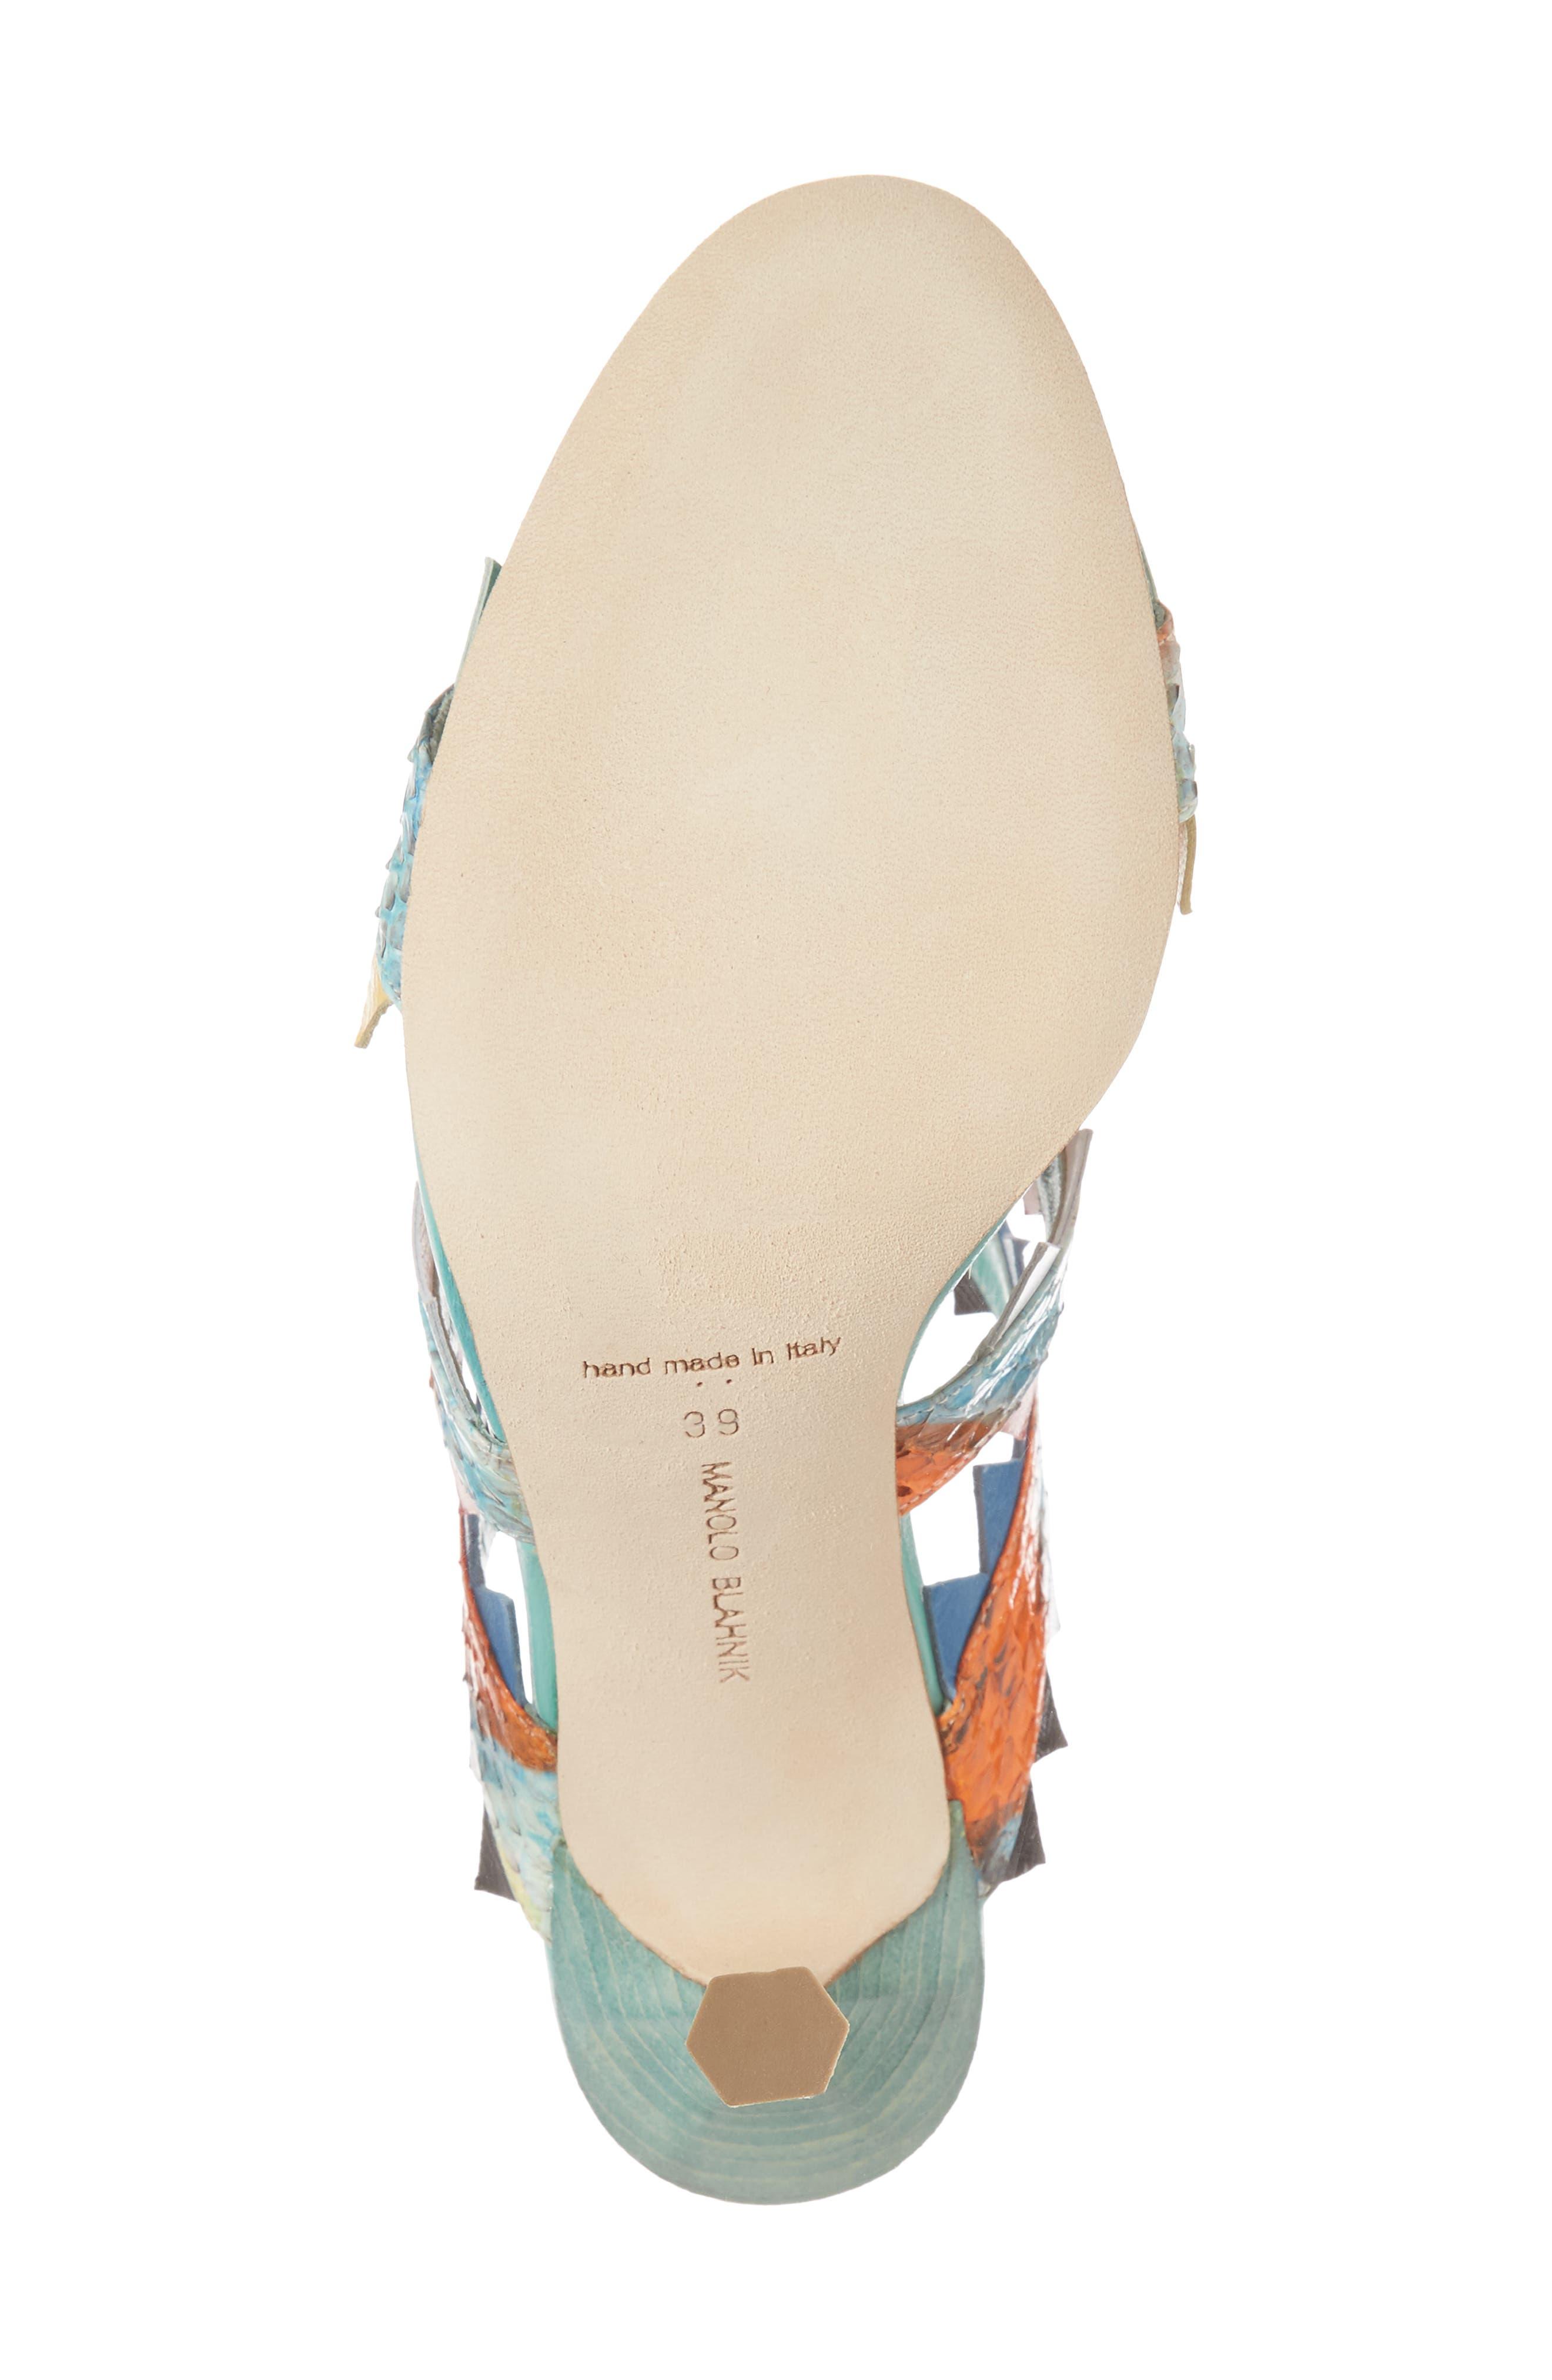 Arpege Mule Sandal,                             Alternate thumbnail 6, color,                             Watersnake Multi